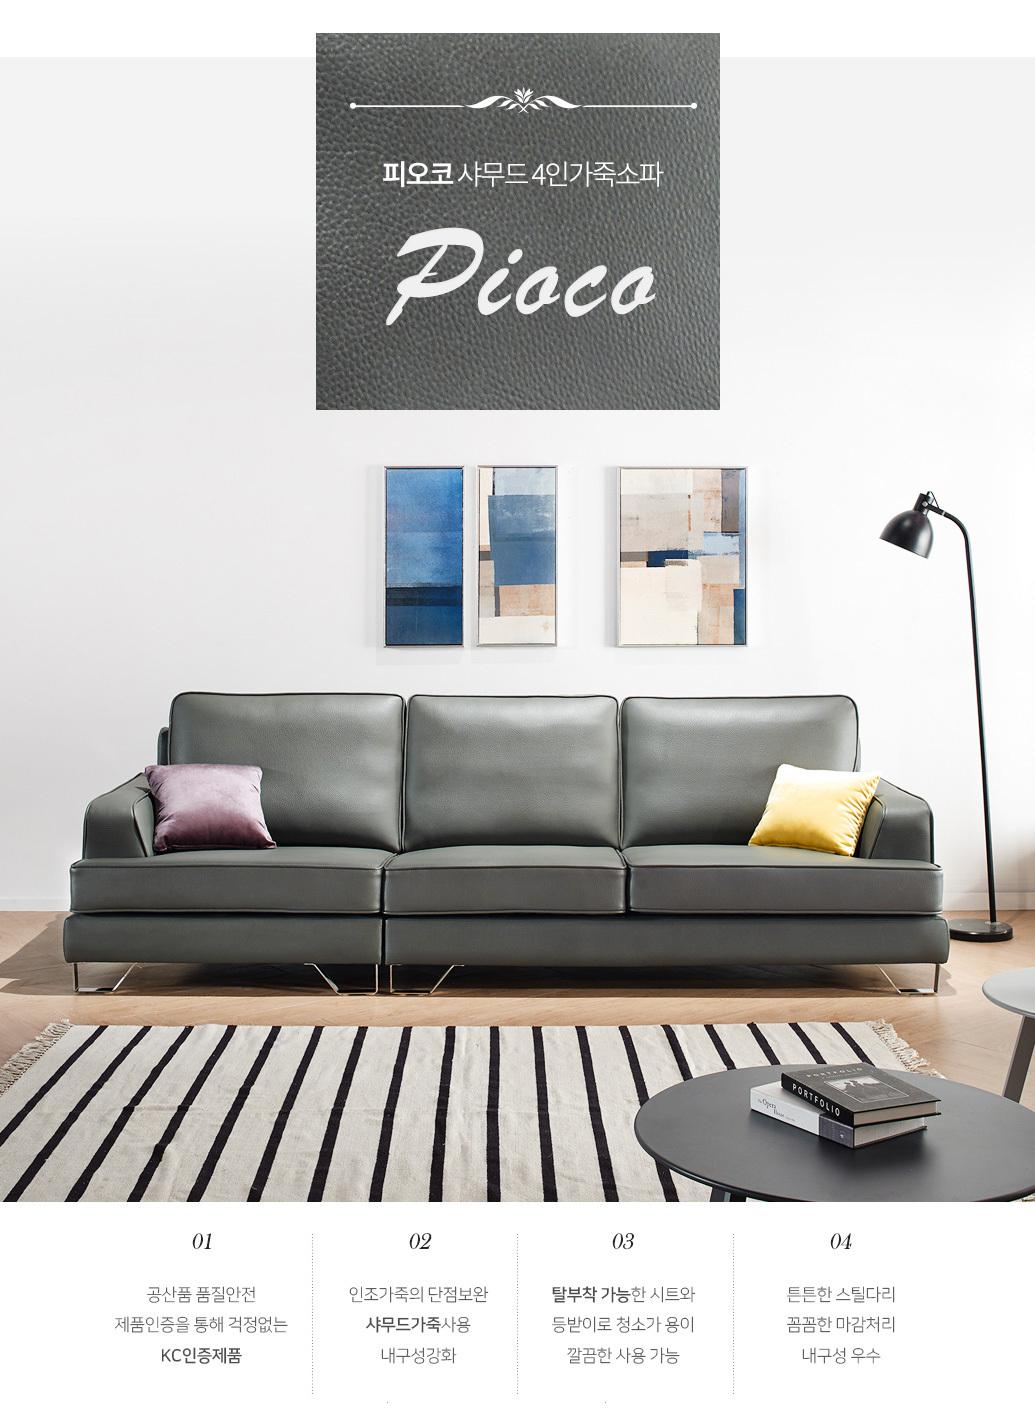 pioco_01.jpg